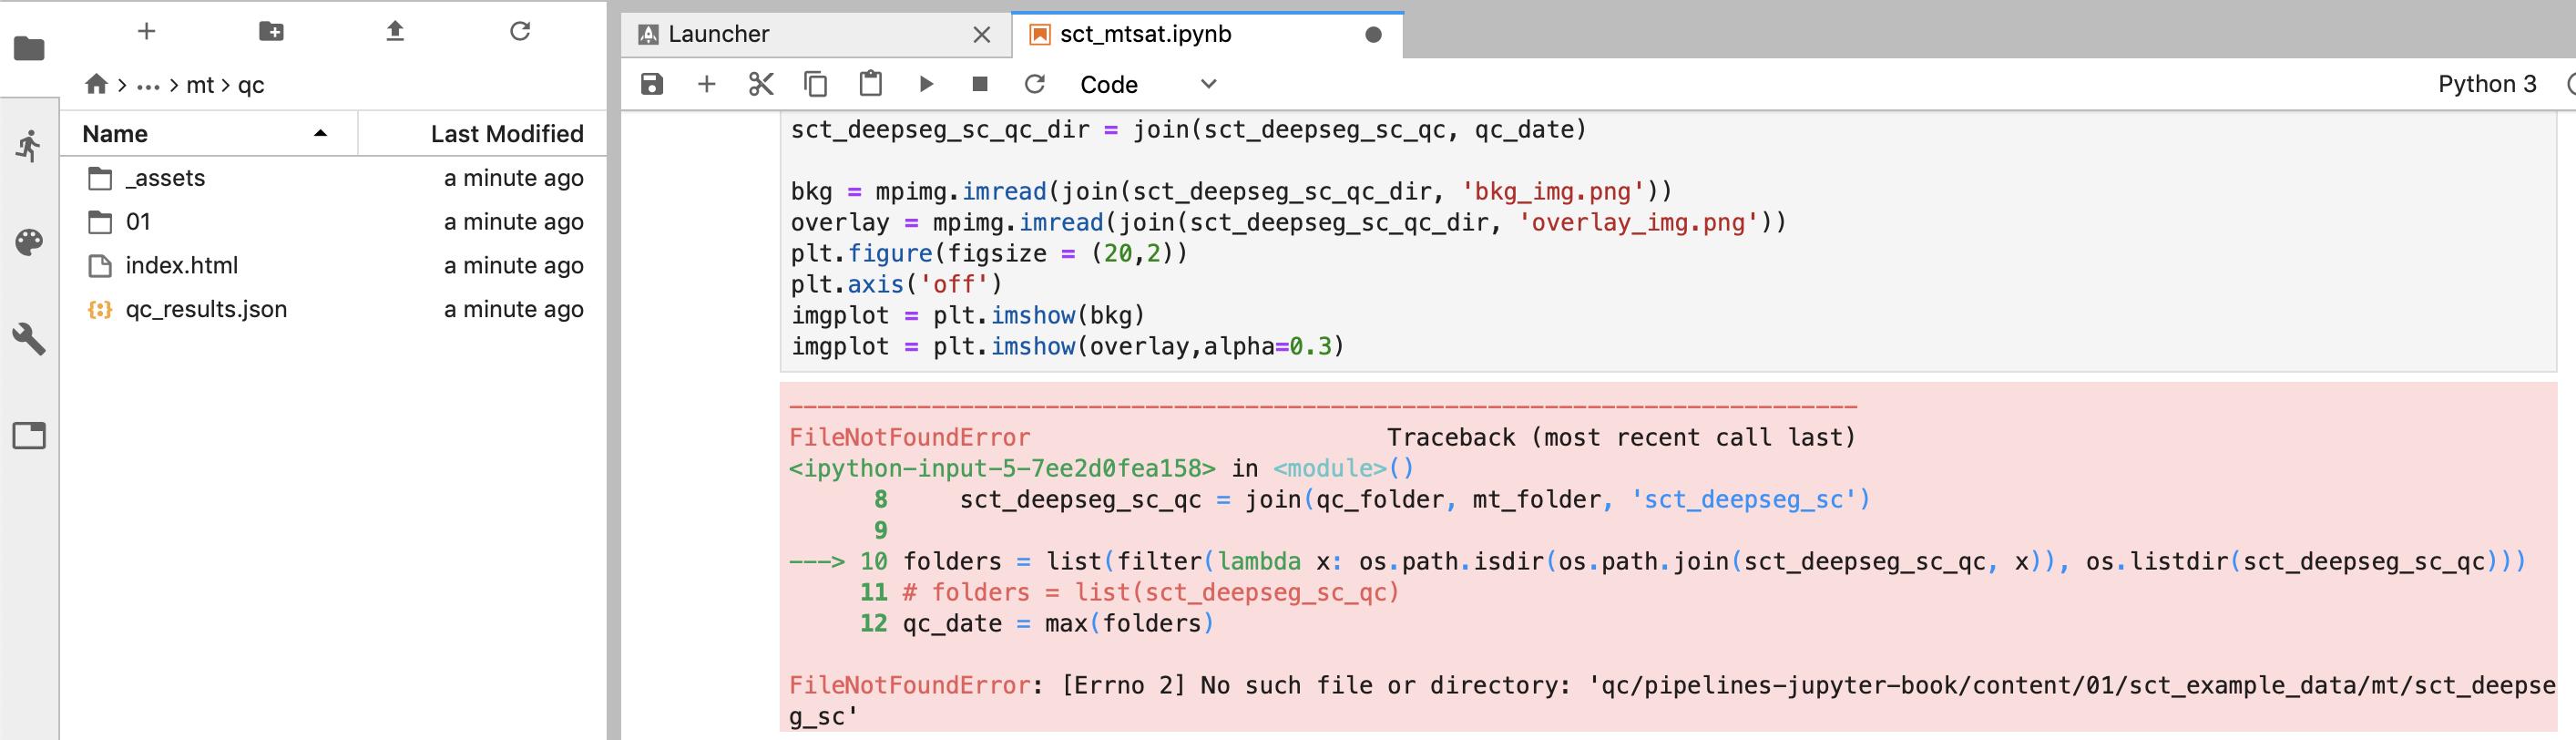 Create a Jupyter notebook · Issue #2 · sct-pipeline/binder